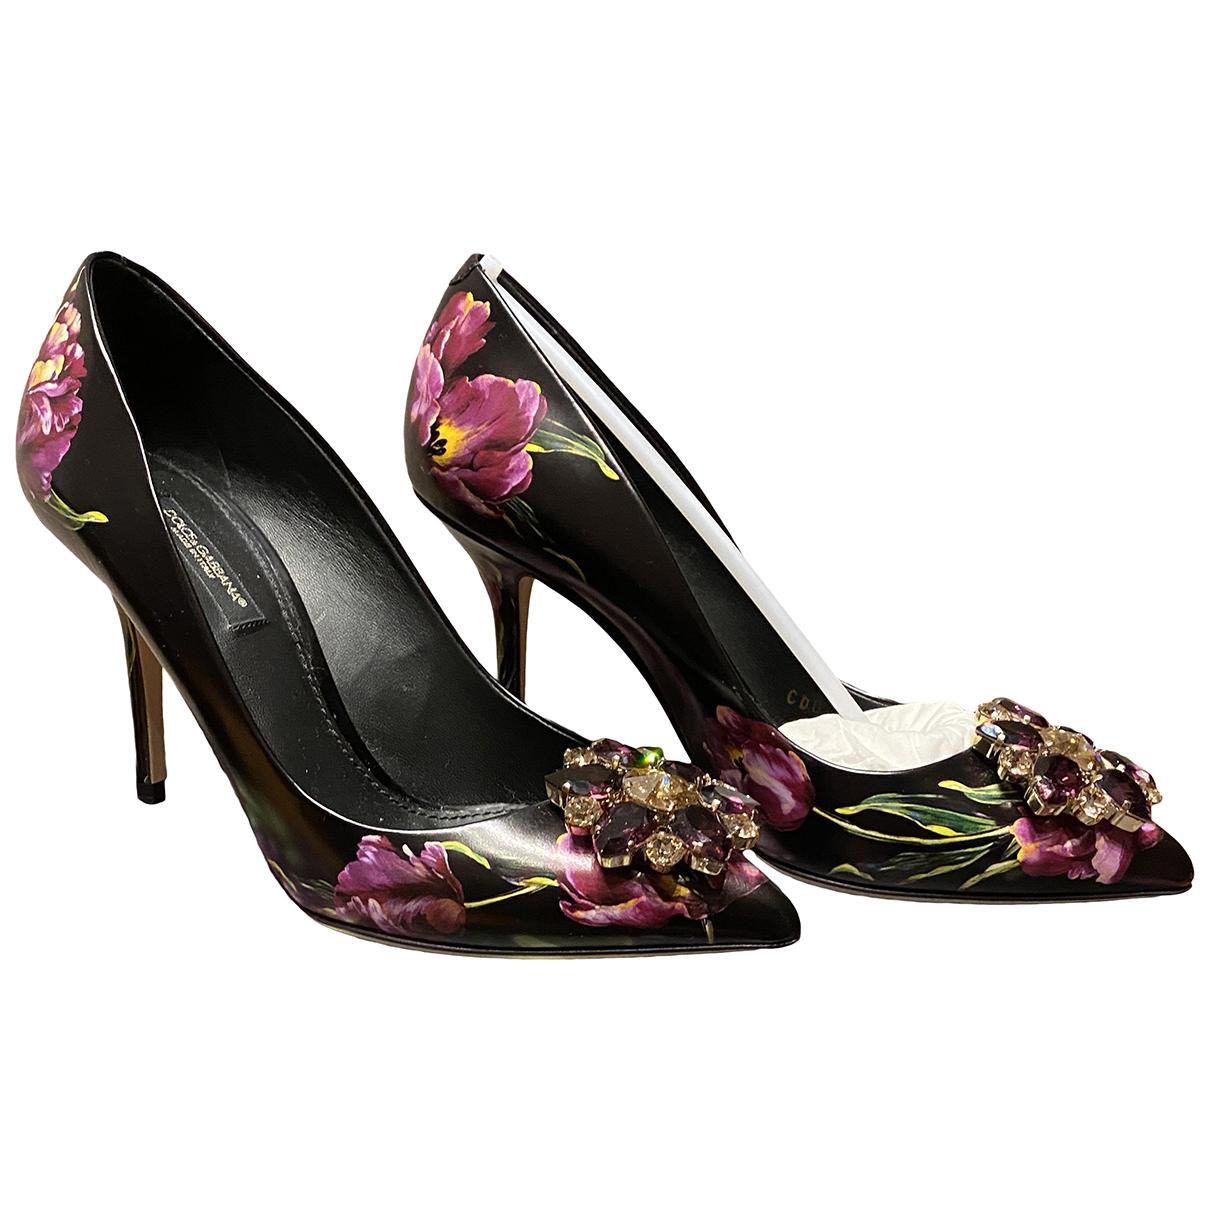 Dolce & Gabbana Taormina Black Leather Heels for Women 36.5 IT